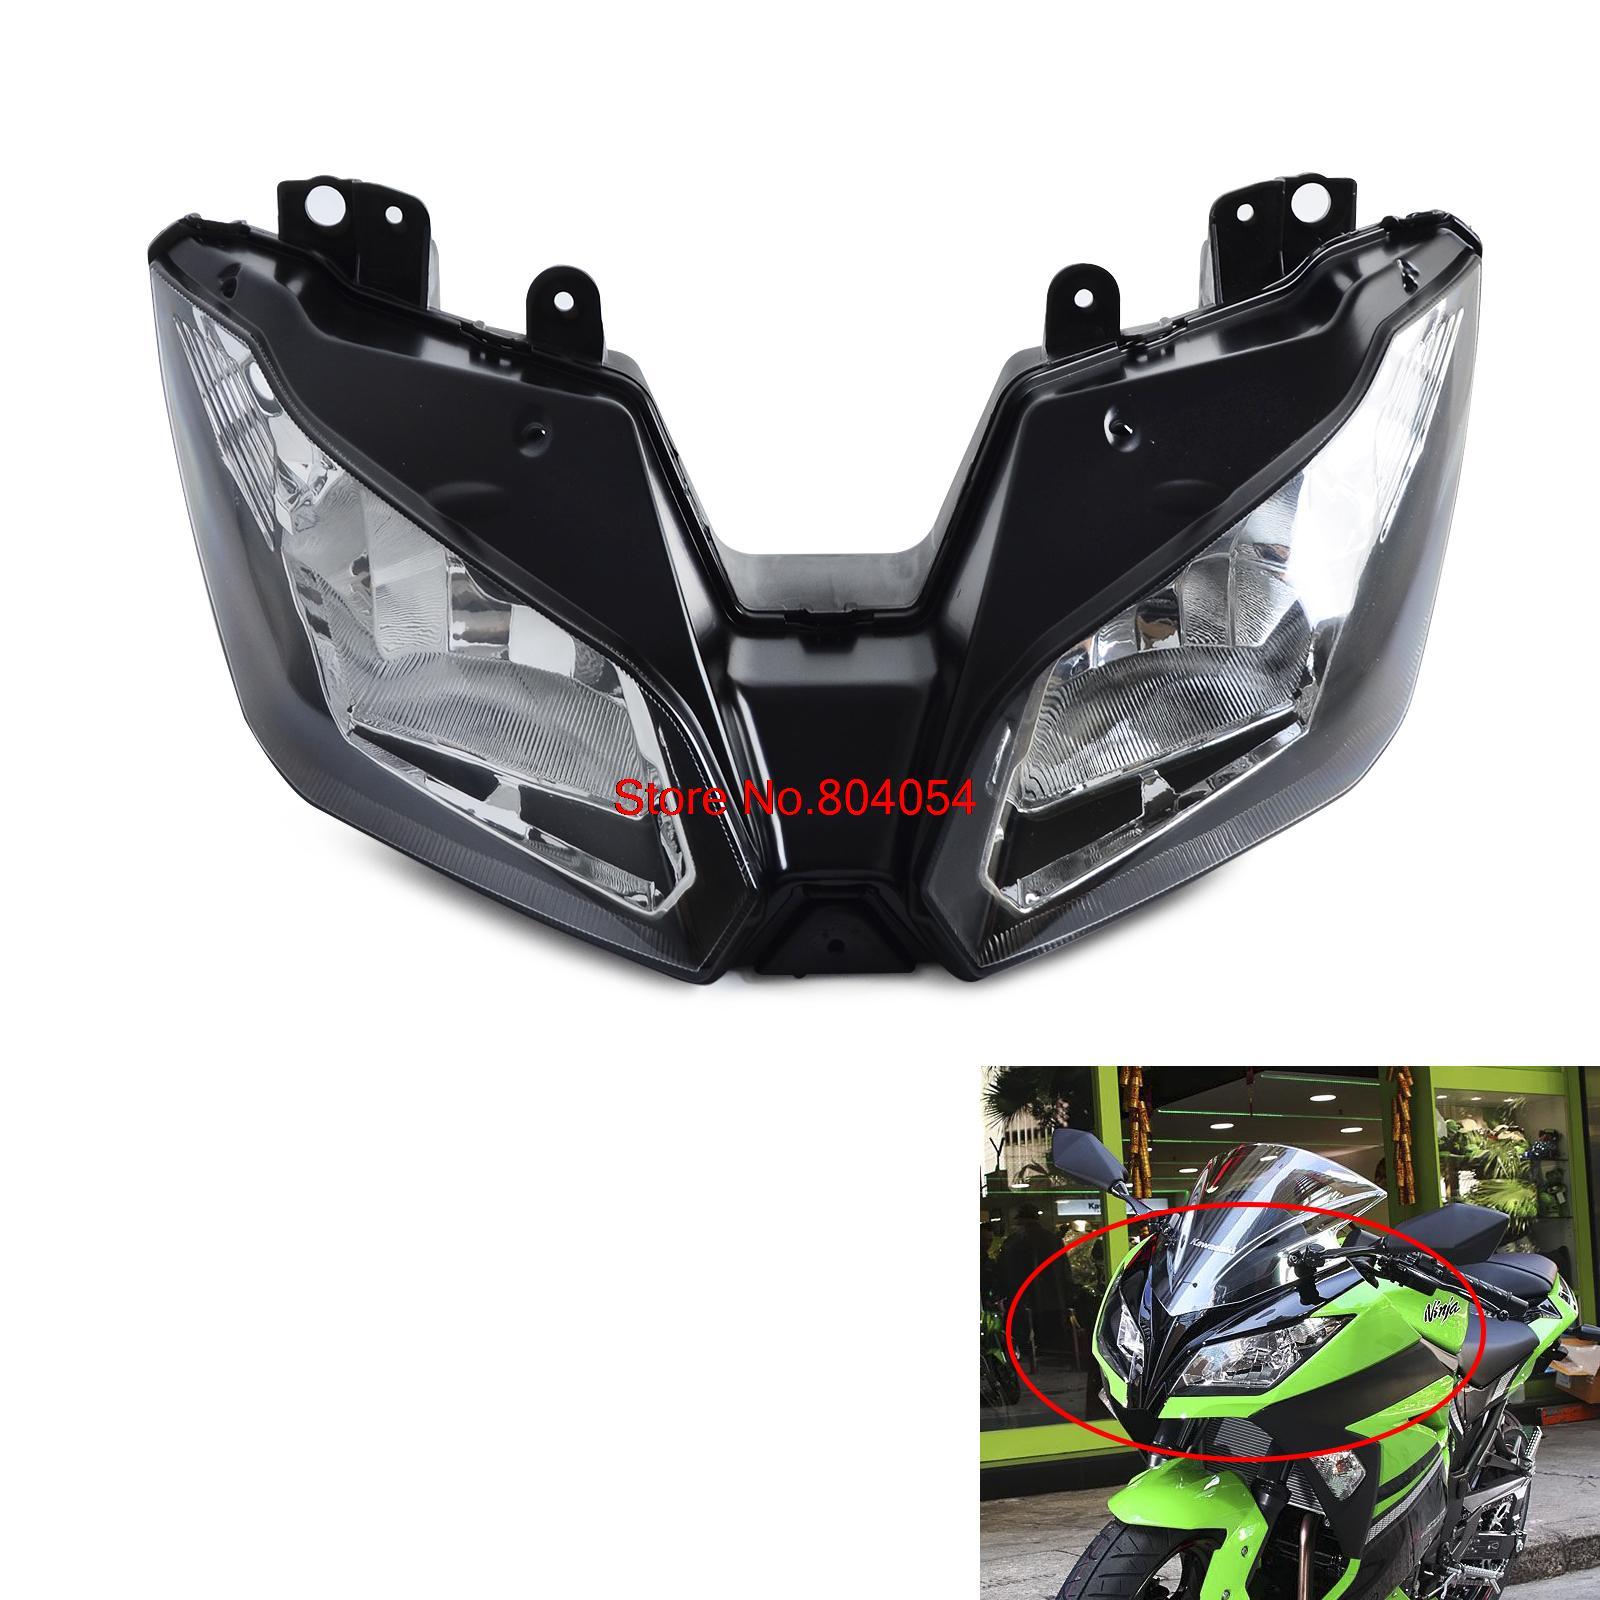 Front Headlight Headlamp Head Lamp Light Clear For Ninja 300 2013 2014 2015 Versys 650 1000 2015 2016 new<br><br>Aliexpress